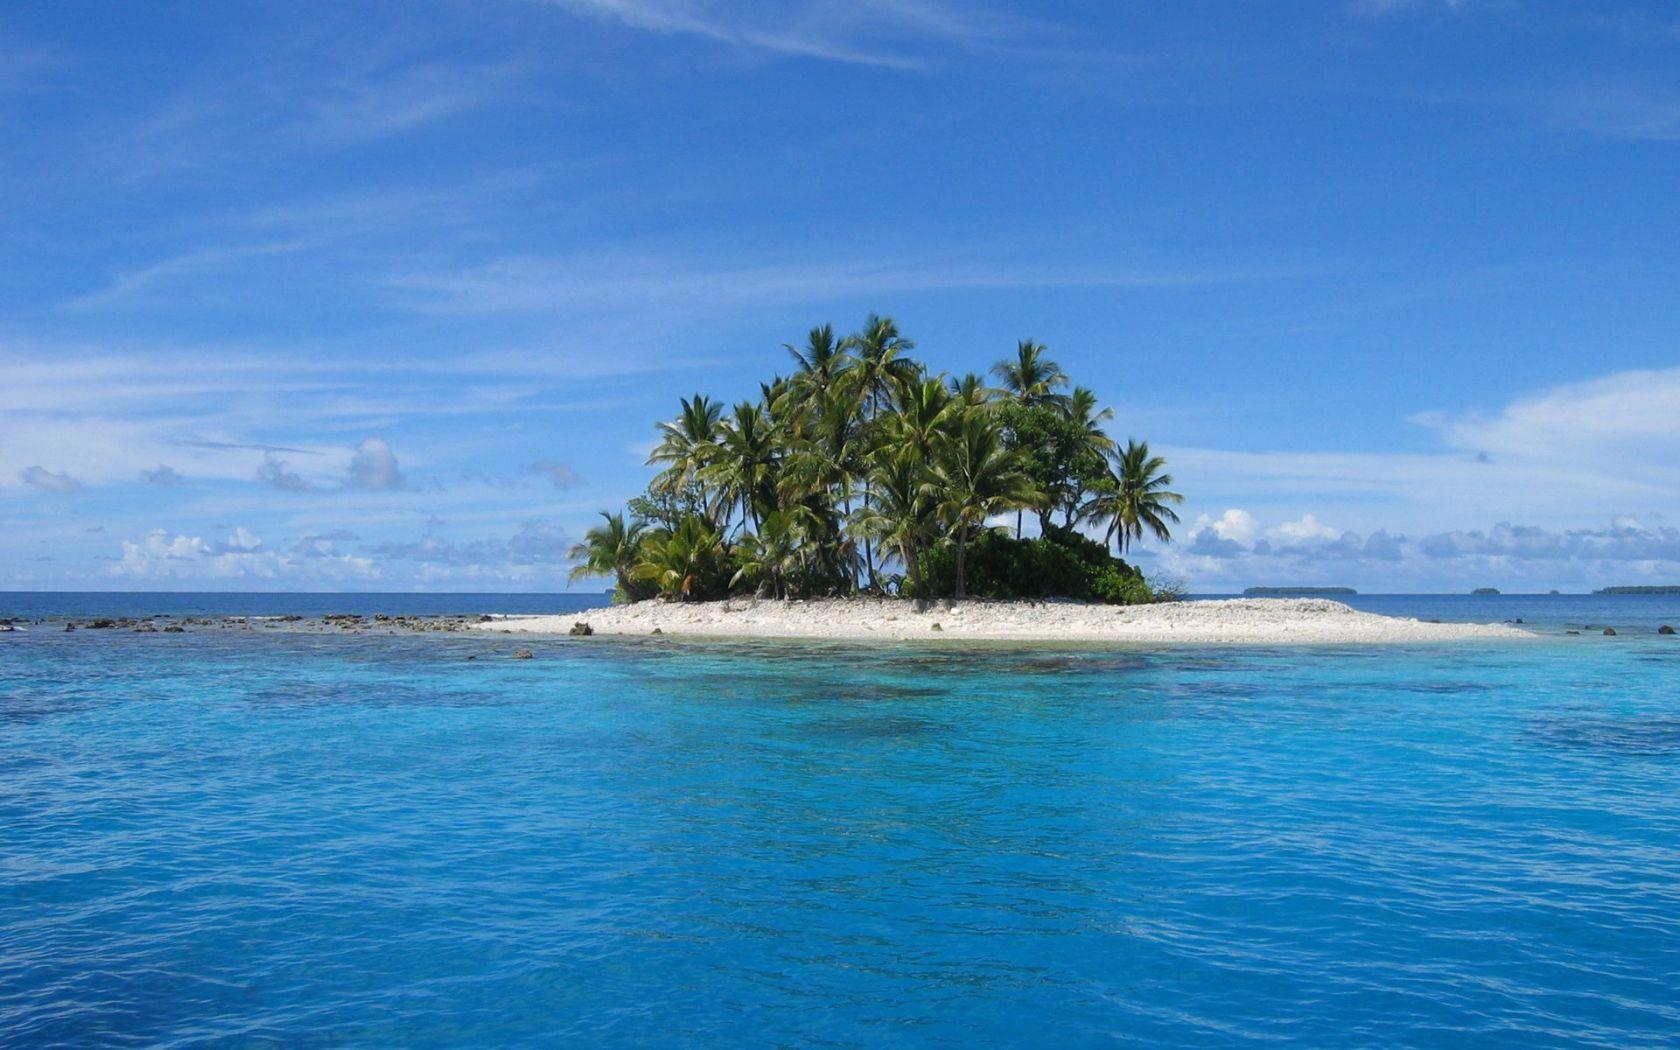 ilha-paradisiaca_1243_1680x1050 – Só Papel de Parede Grátis